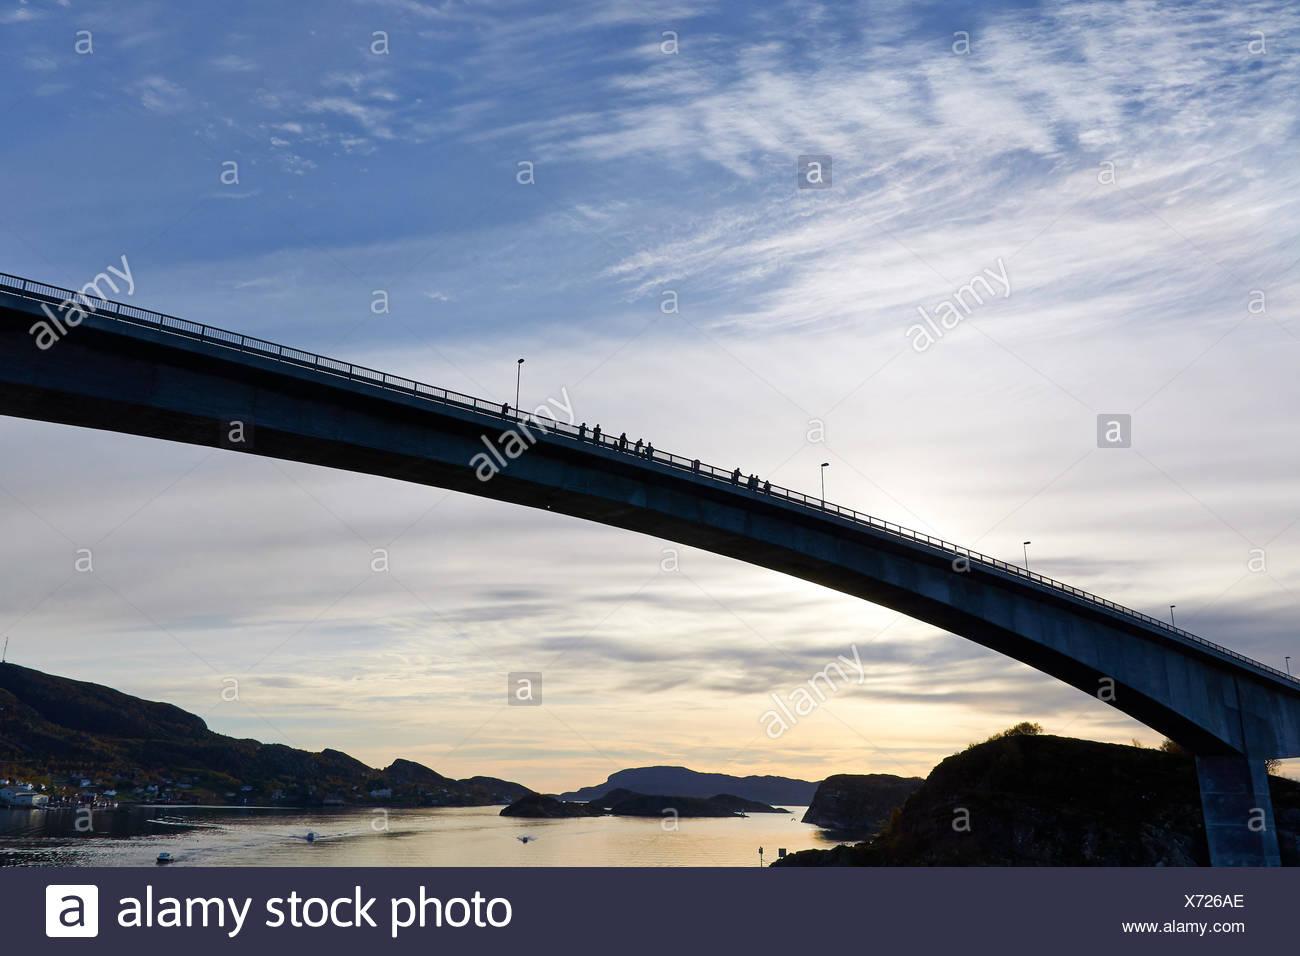 Bridge over the Stokksund, Norway Stock Photo